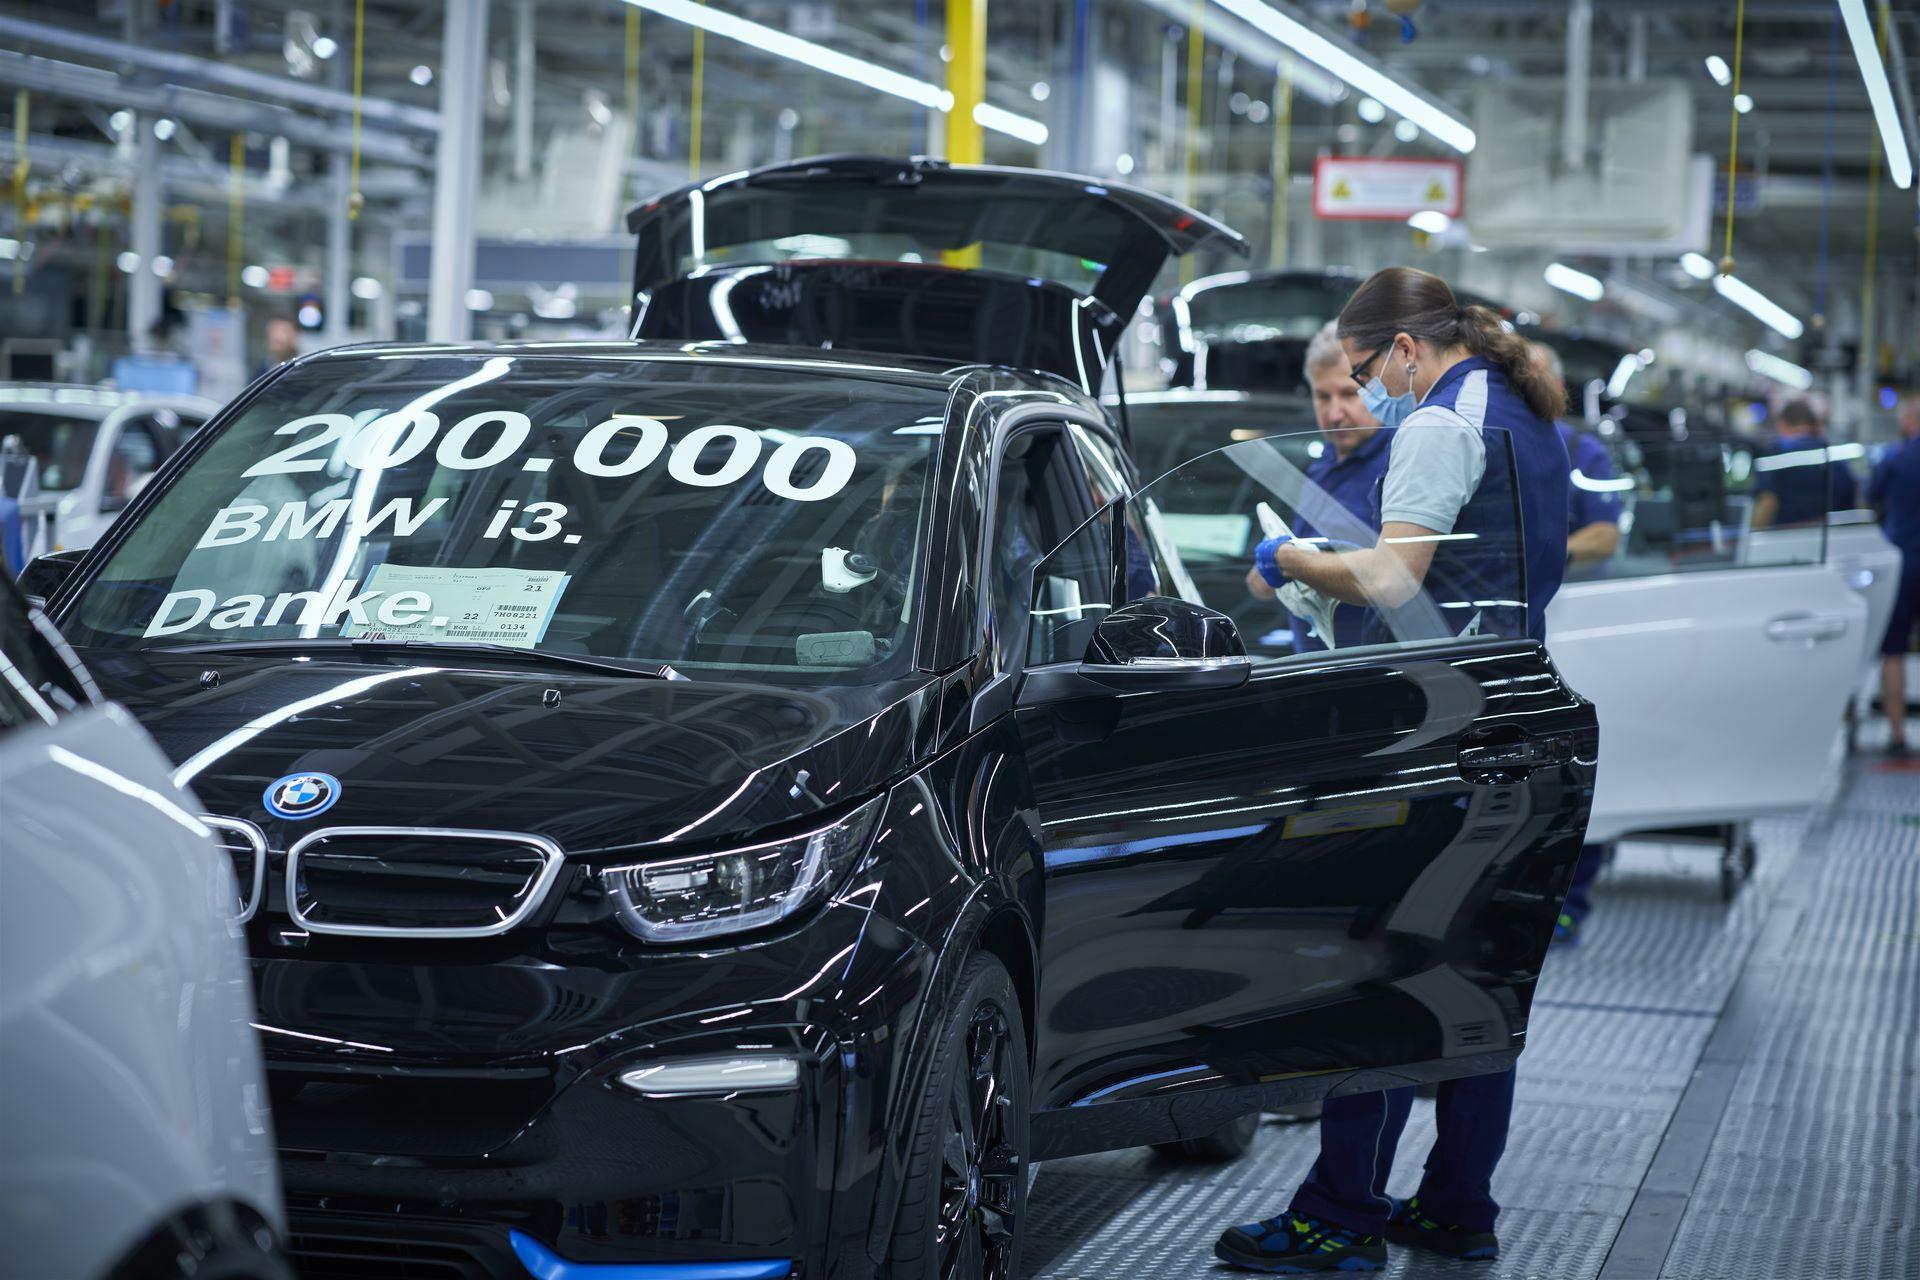 BMW-i8-plant-production-46